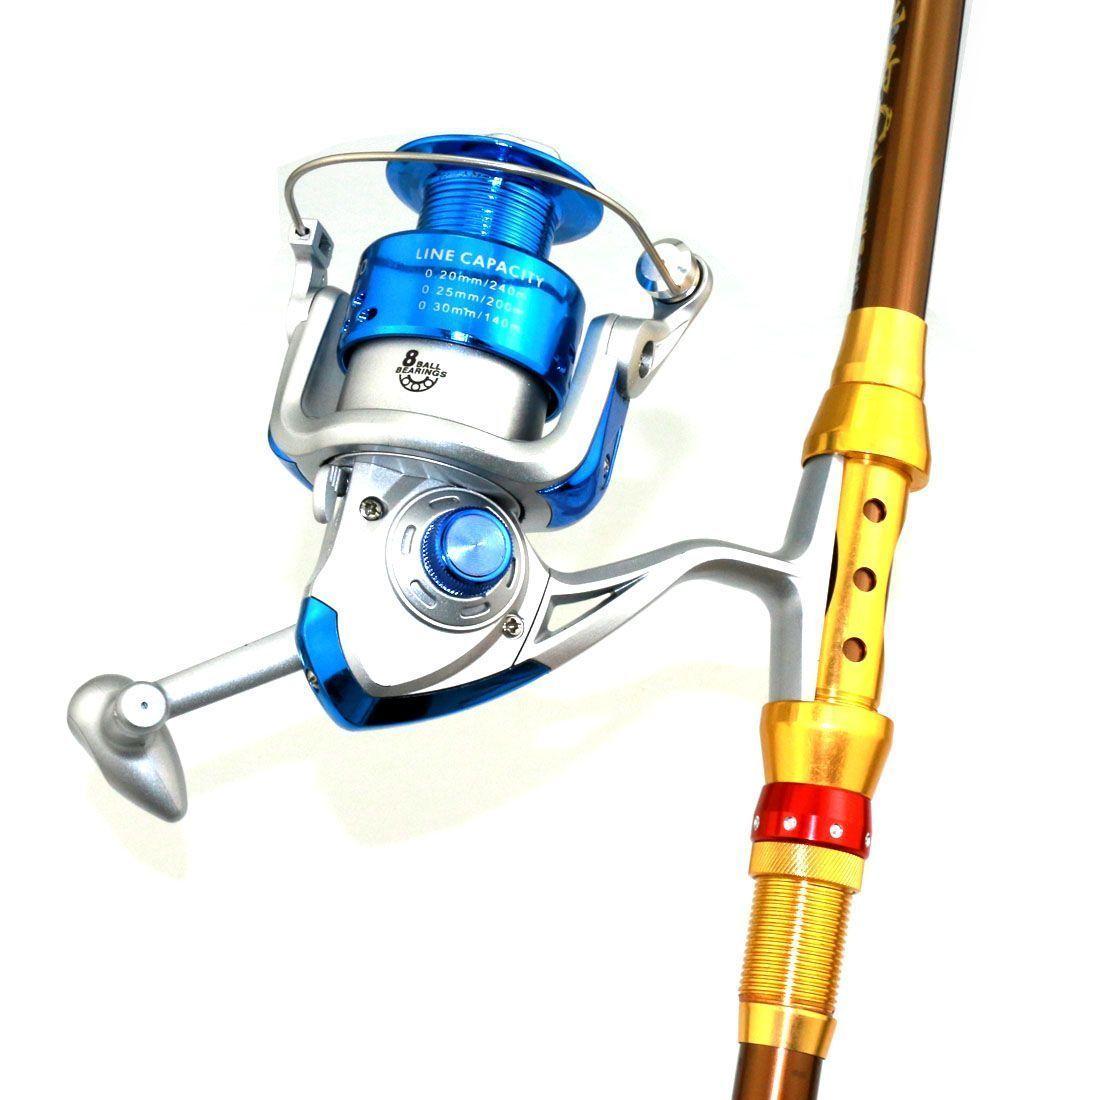 3BB #Boat #CS10007000 #Fishing #fitness #gleitscheiben